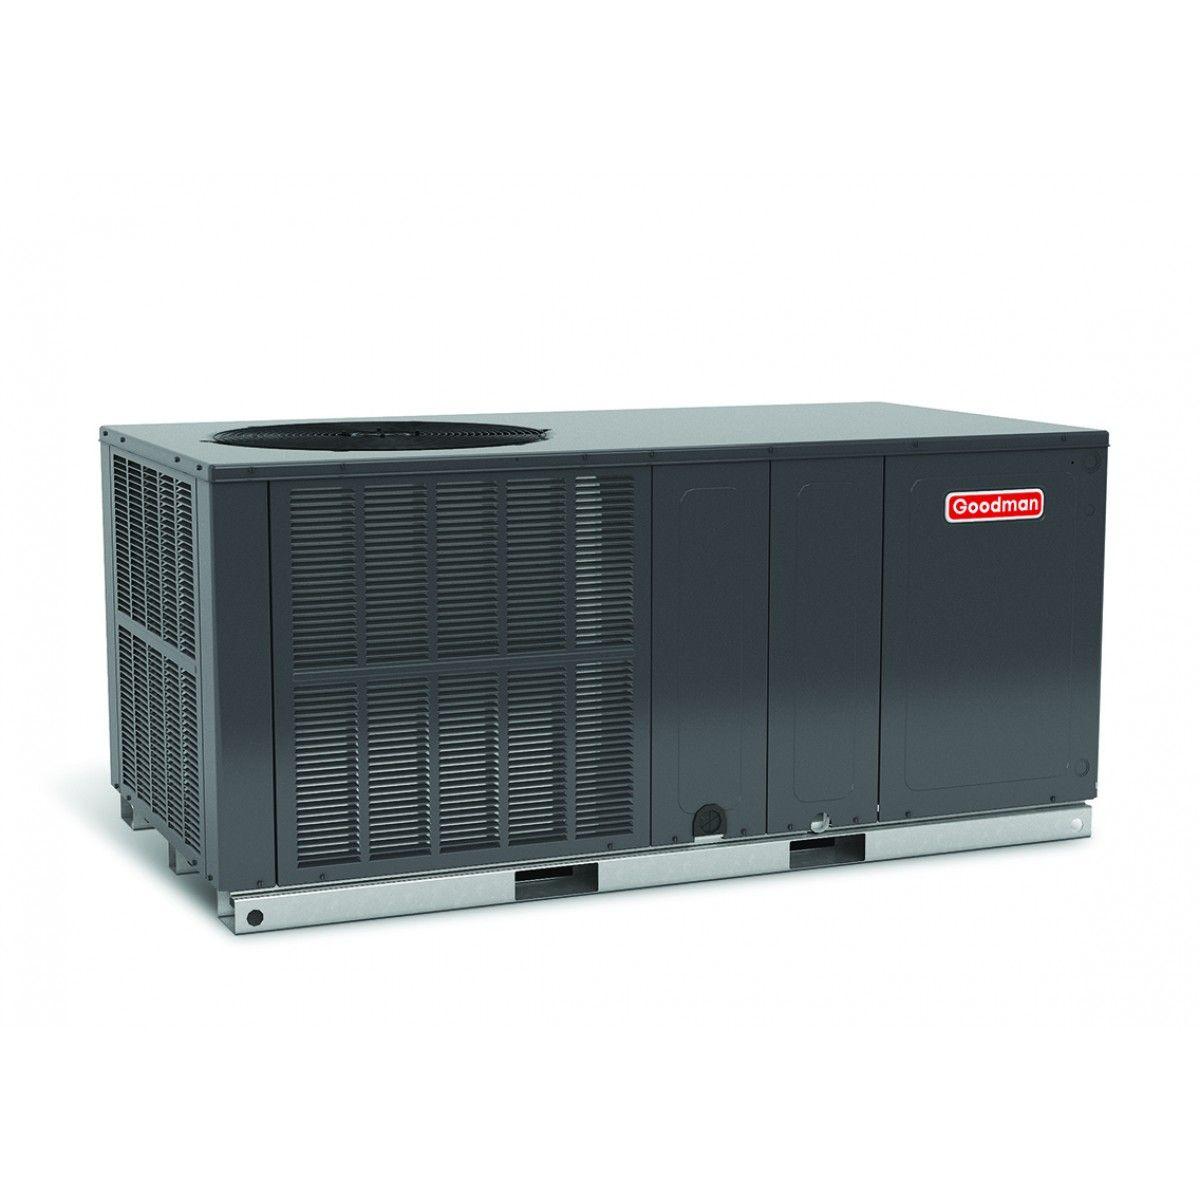 Goodman 3.5 Ton 14 SEER Heat Pump Package Unit Horizontal ...